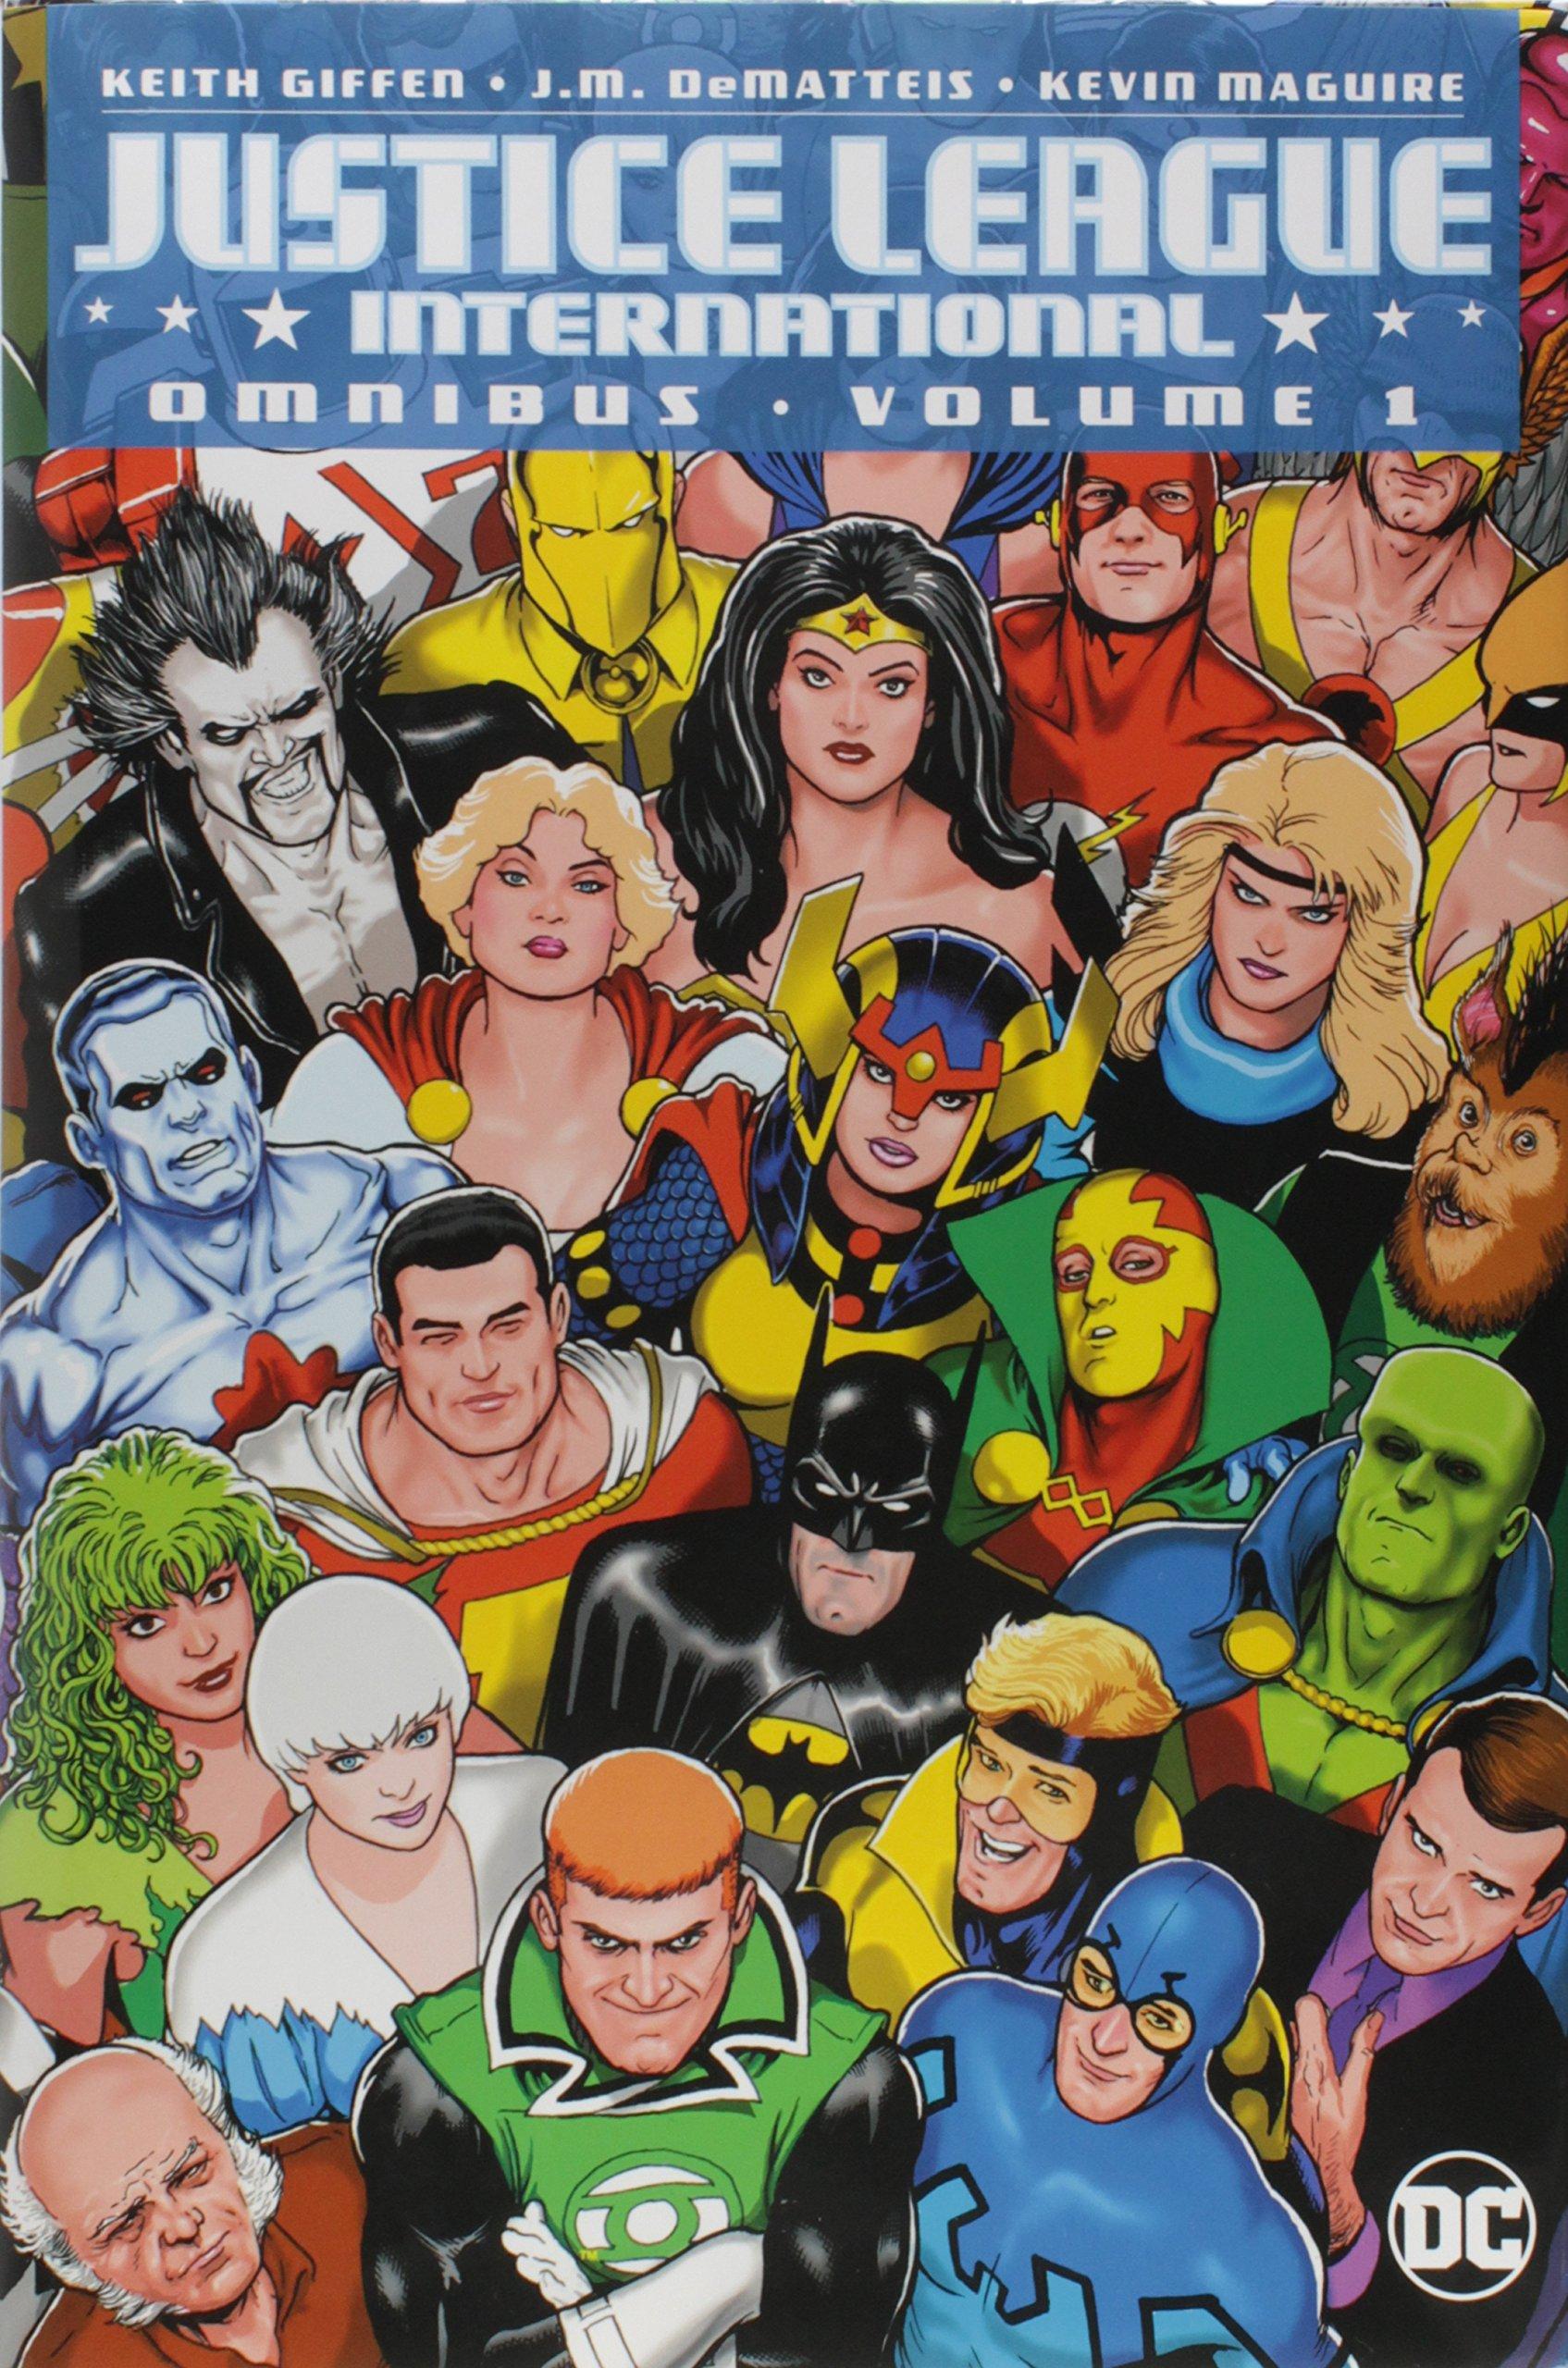 Justice League International Omnibus Vol. 1 by DC Comics